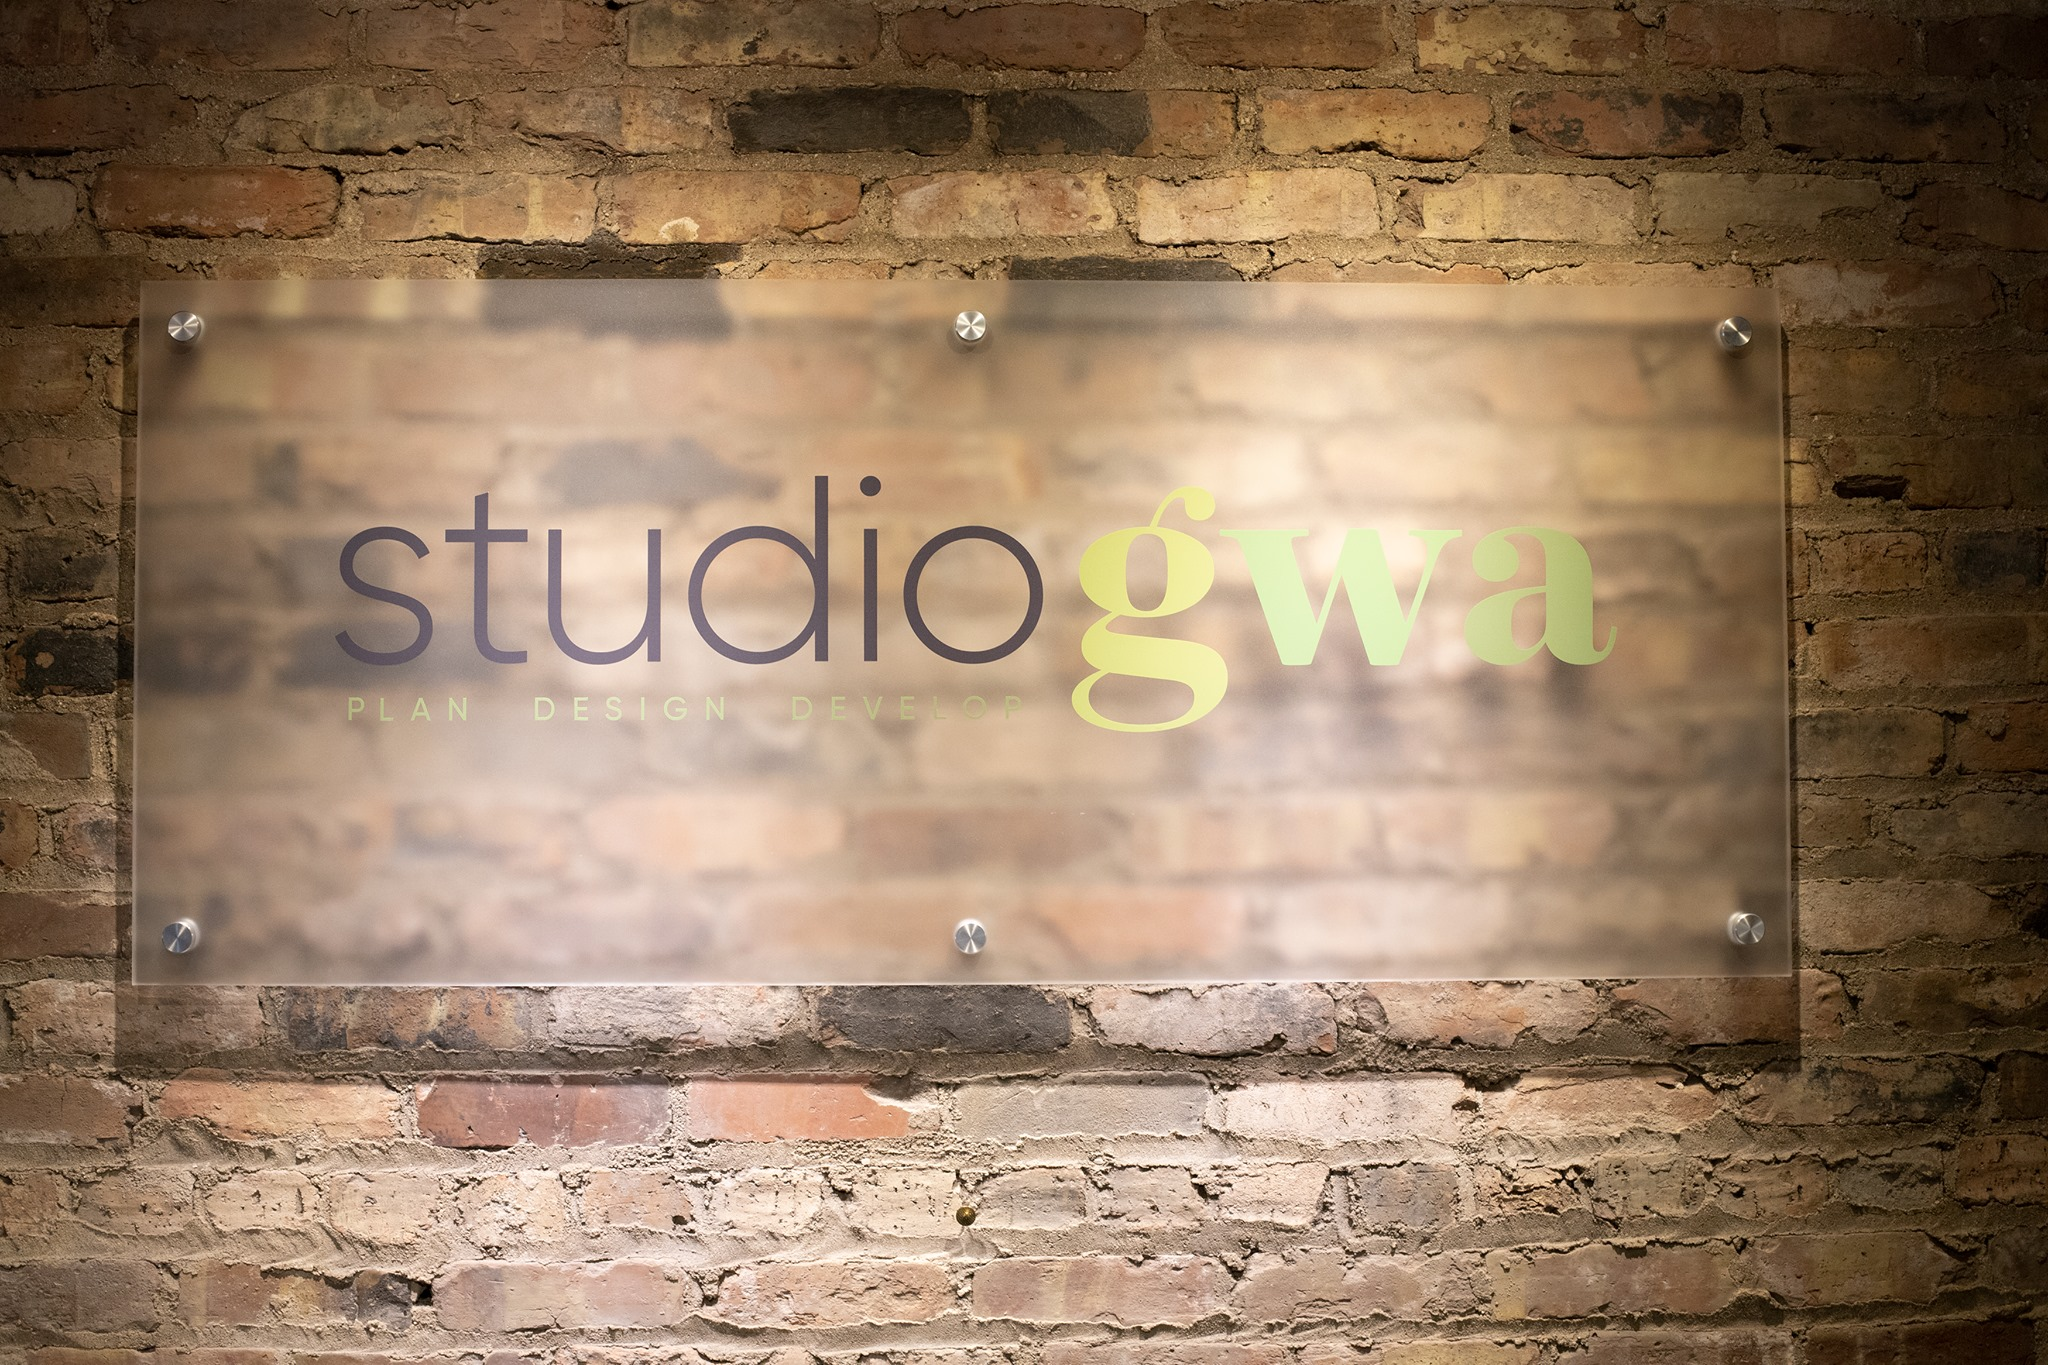 New logo at the Studio GWA office